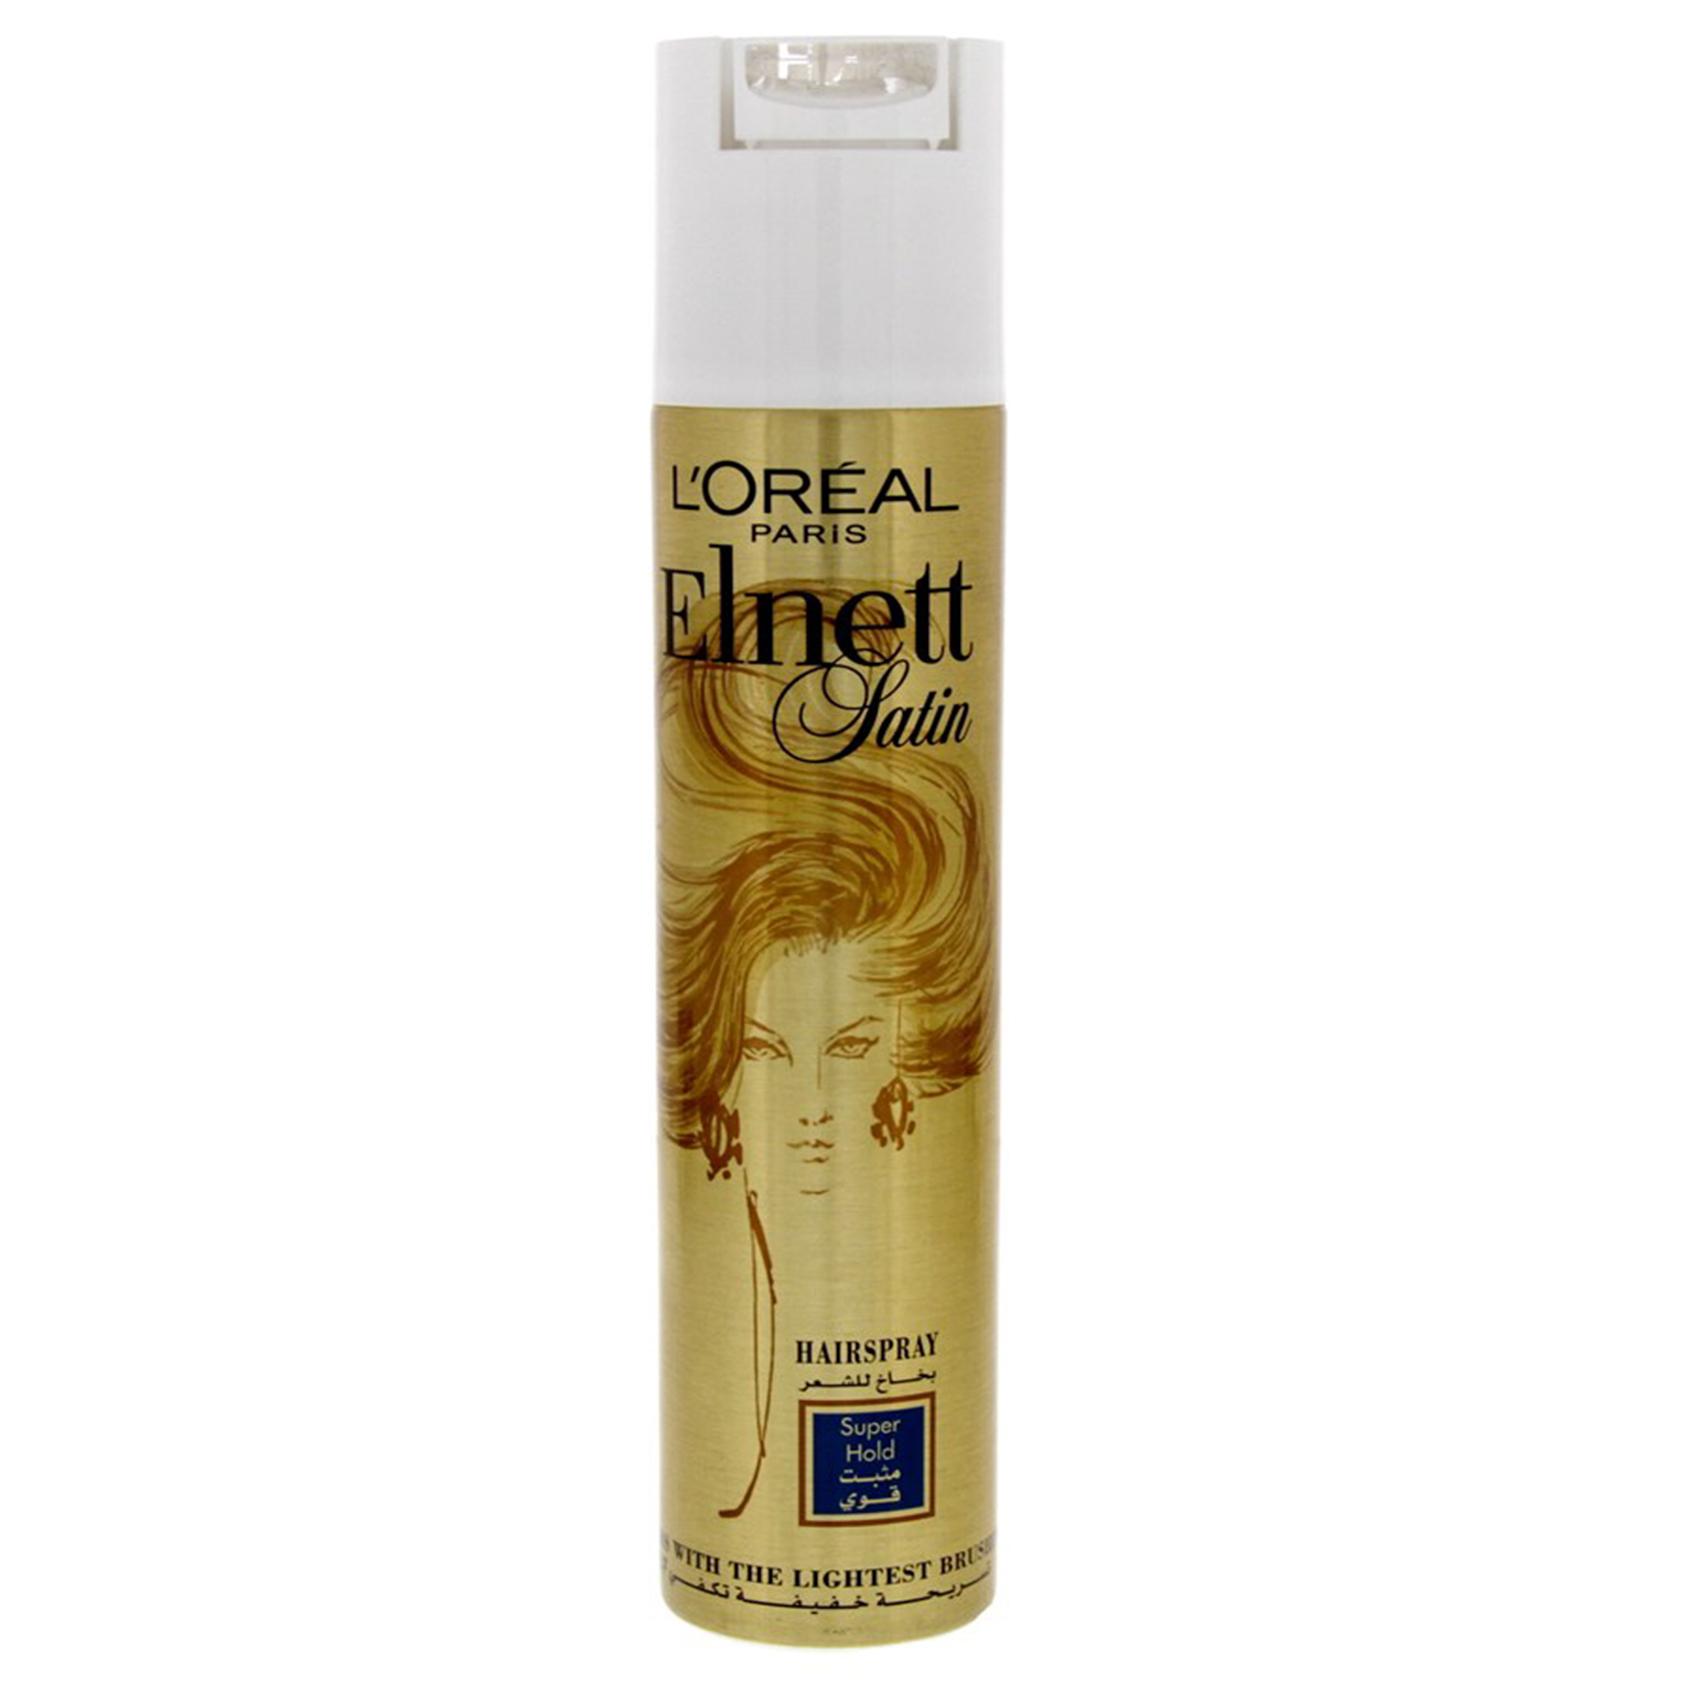 ELNETT HAIR SPRAY SUPER HOLD 70ML